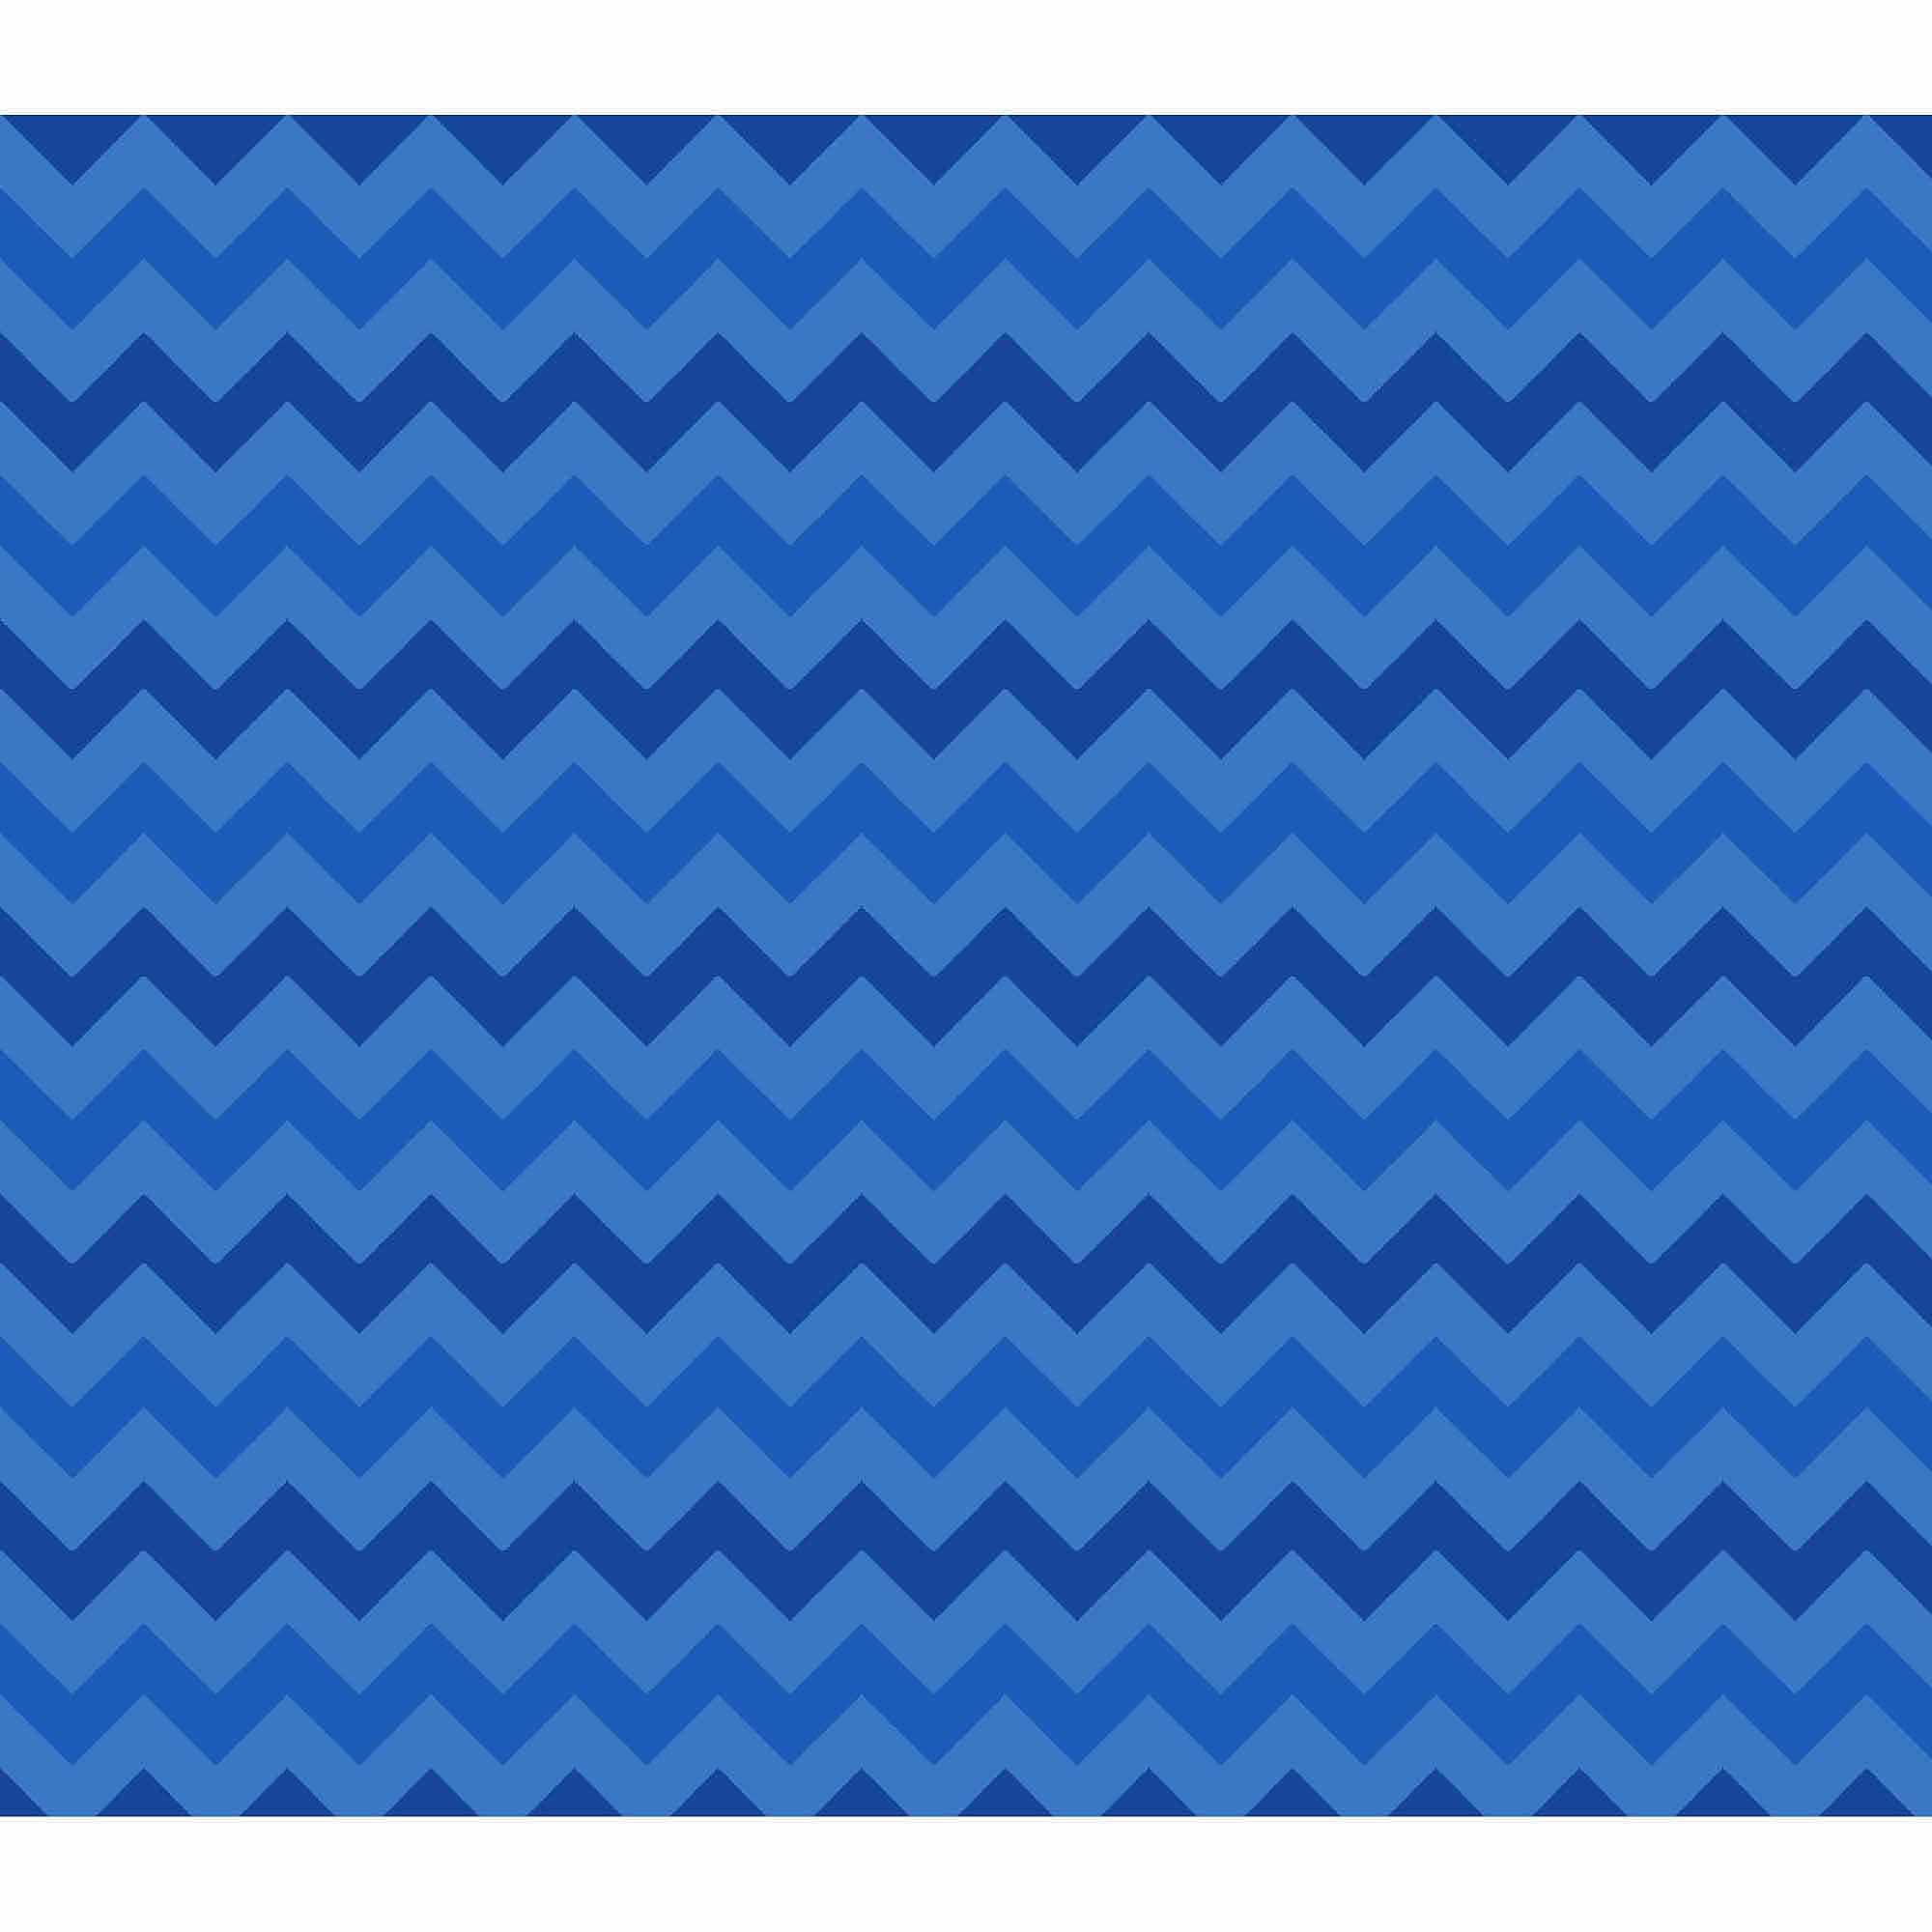 Springs Creative Cotton Blenders Tonal Chevron, Blue, Fabric by the Yard